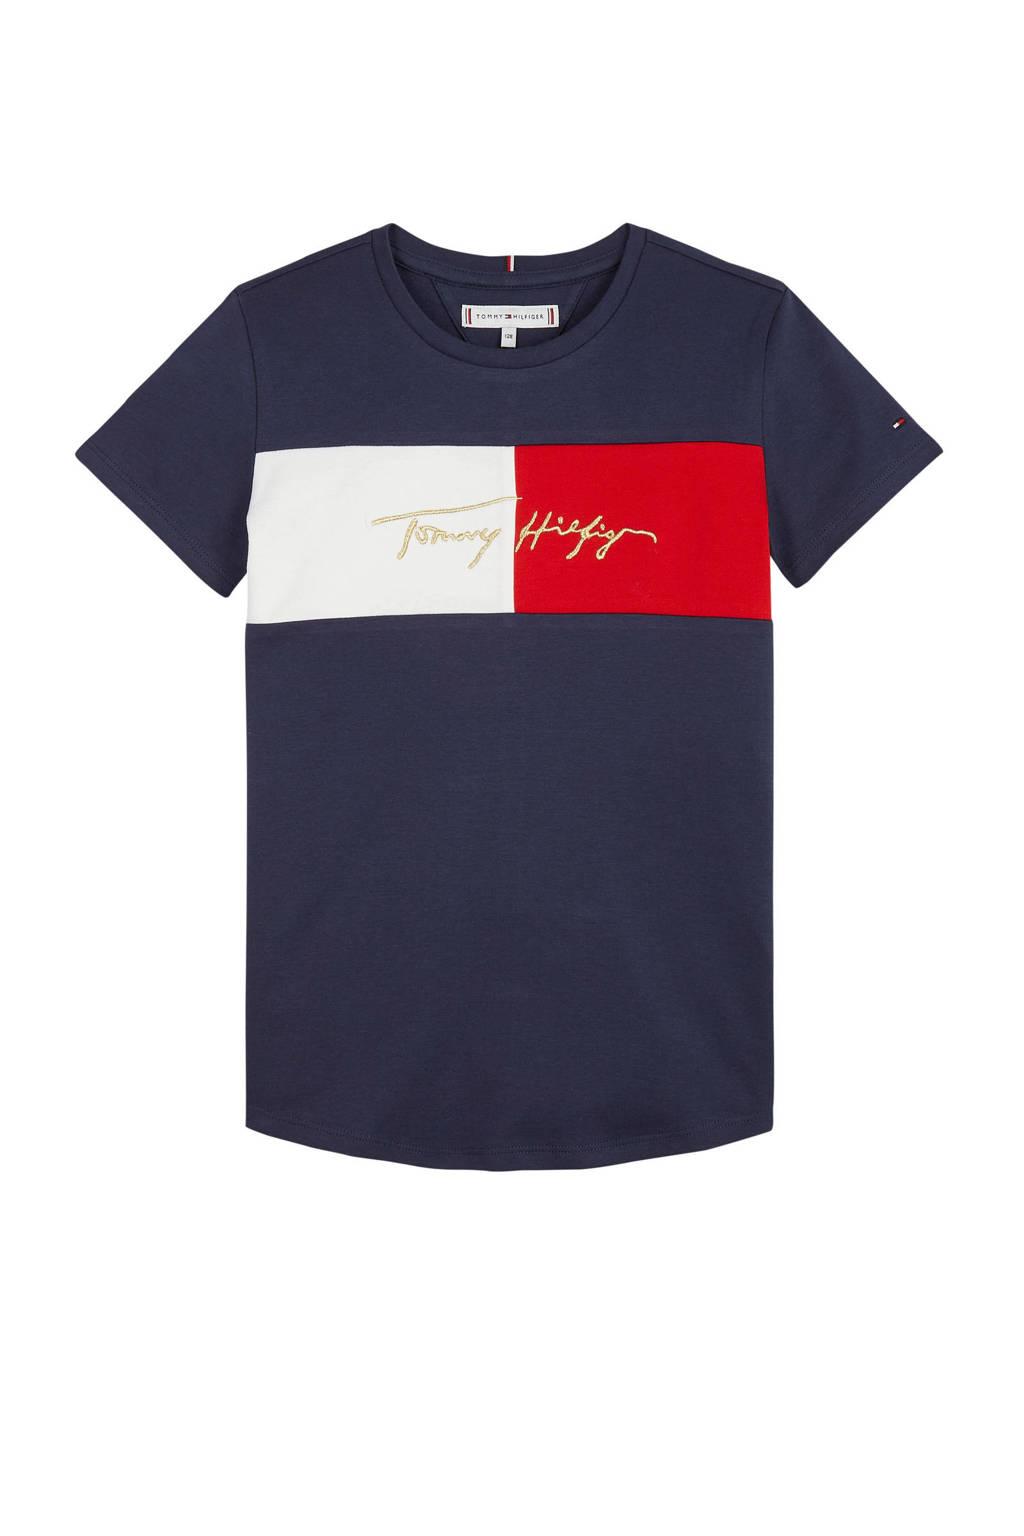 Tommy Hilfiger T-shirt met logo donkerblauw, Donkerblauw